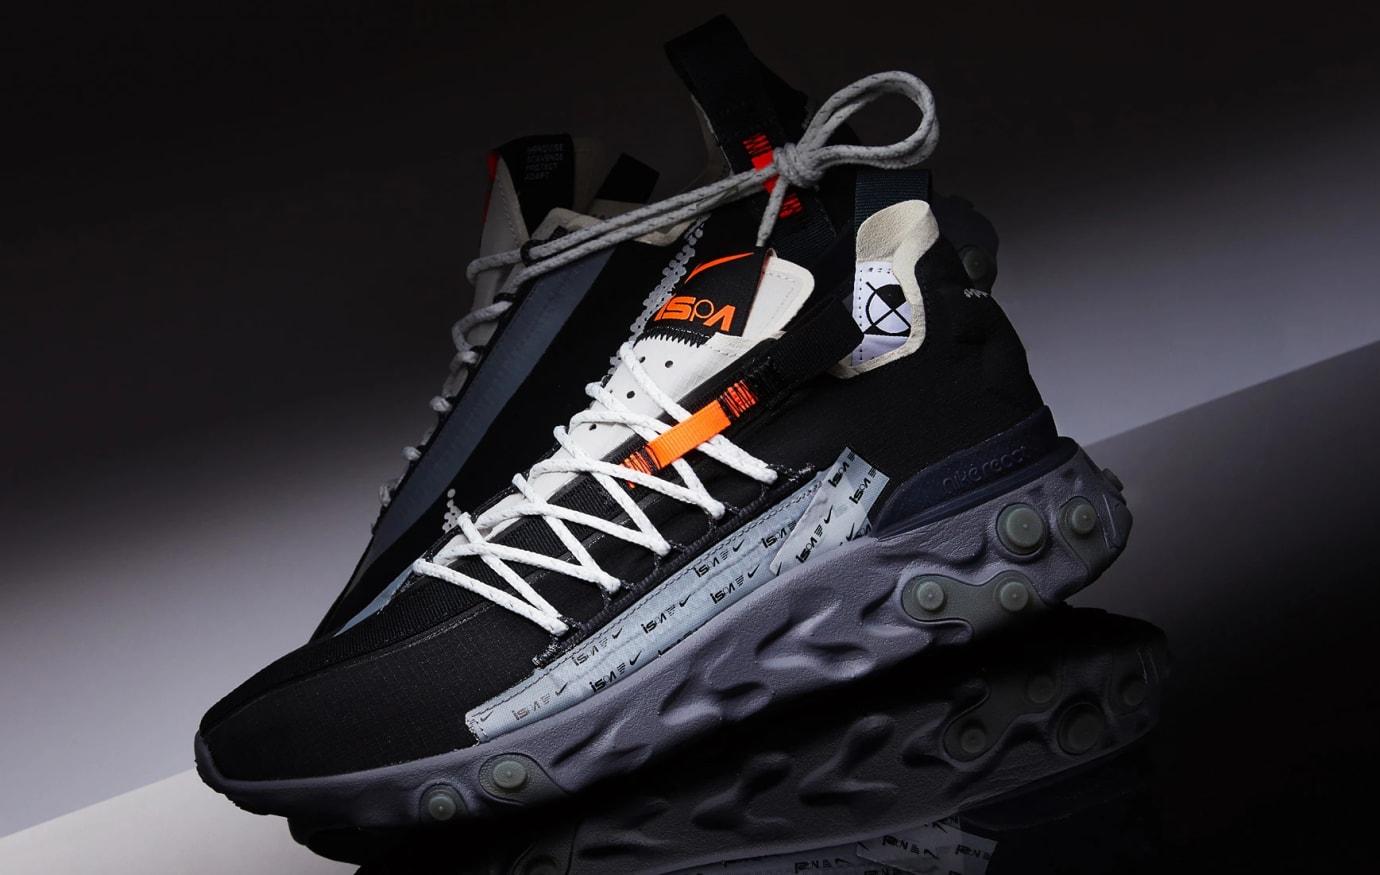 Nike React WR ISPA 'Black/Metallic Silver' AR8555-001 (Pair)